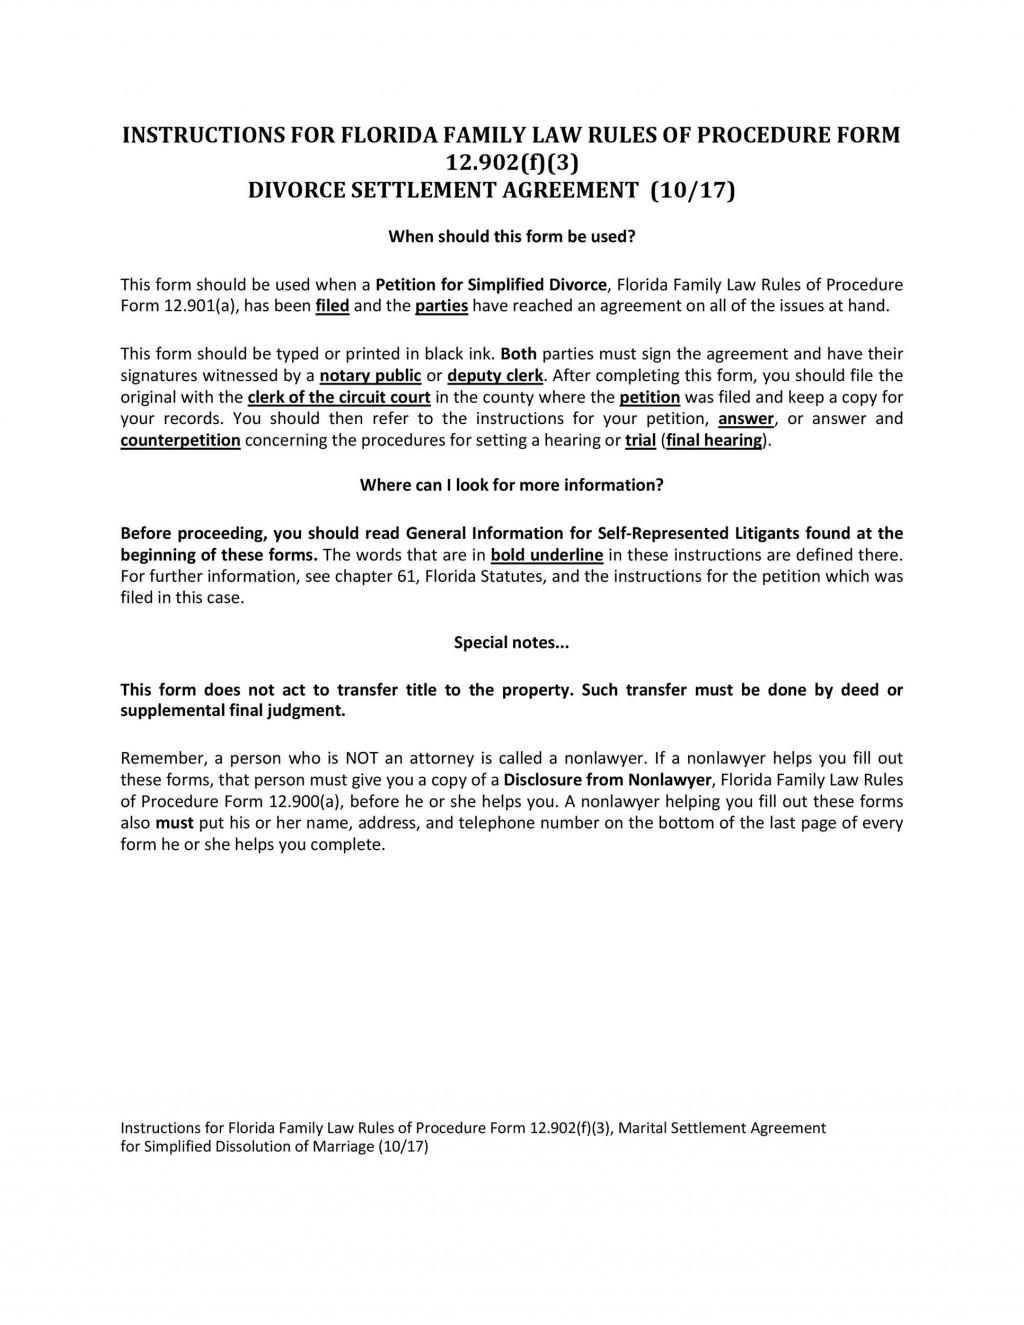 006 Unforgettable Divorce Settlement Agreement Template Highest Quality  Sample New York Marital Uk South AfricaLarge